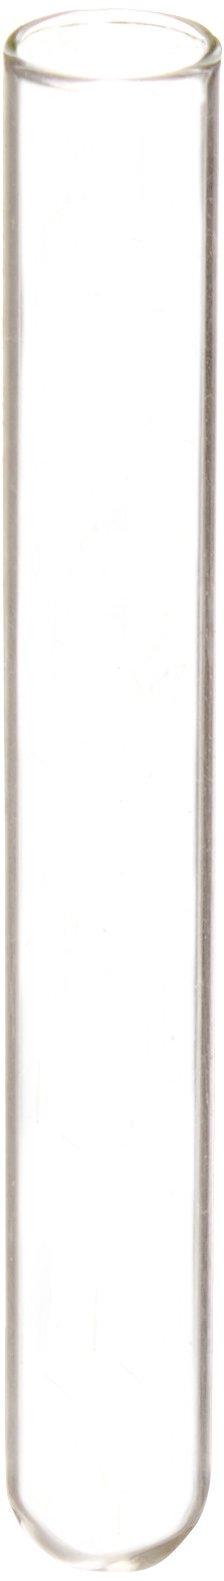 Globe Scientific 1503 Borosilicate Glass Culture Tube, 10mm Diameter x 75mm Length, 3mL Capacity (Case of 1000)